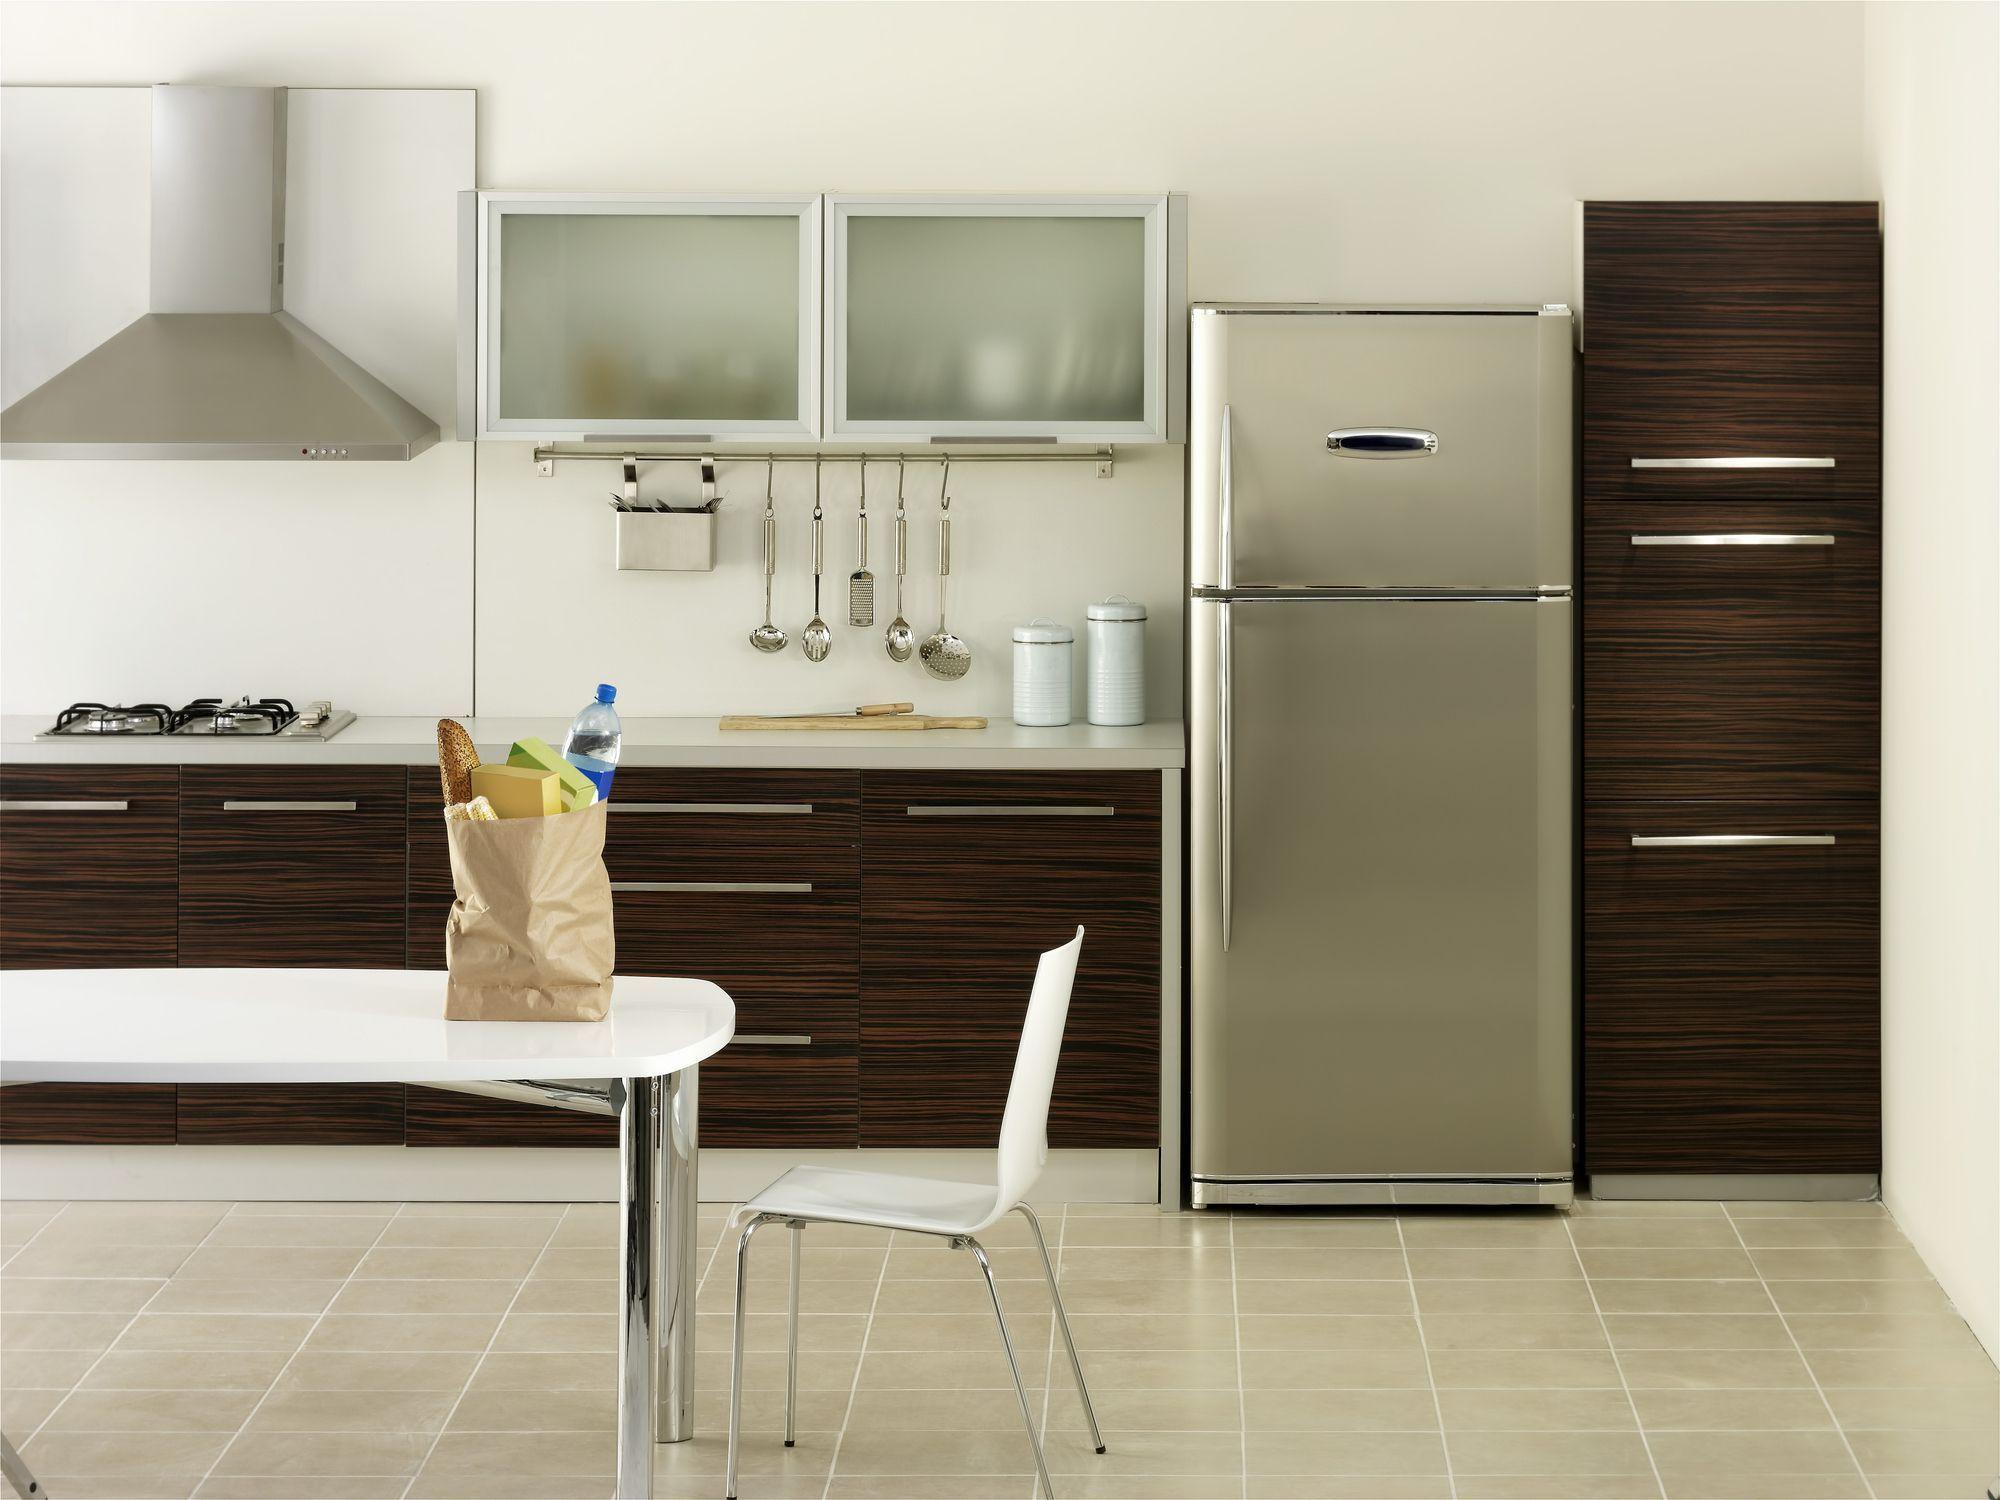 The 8 Best TopFreezer Refrigerators of 2020 Kitchen